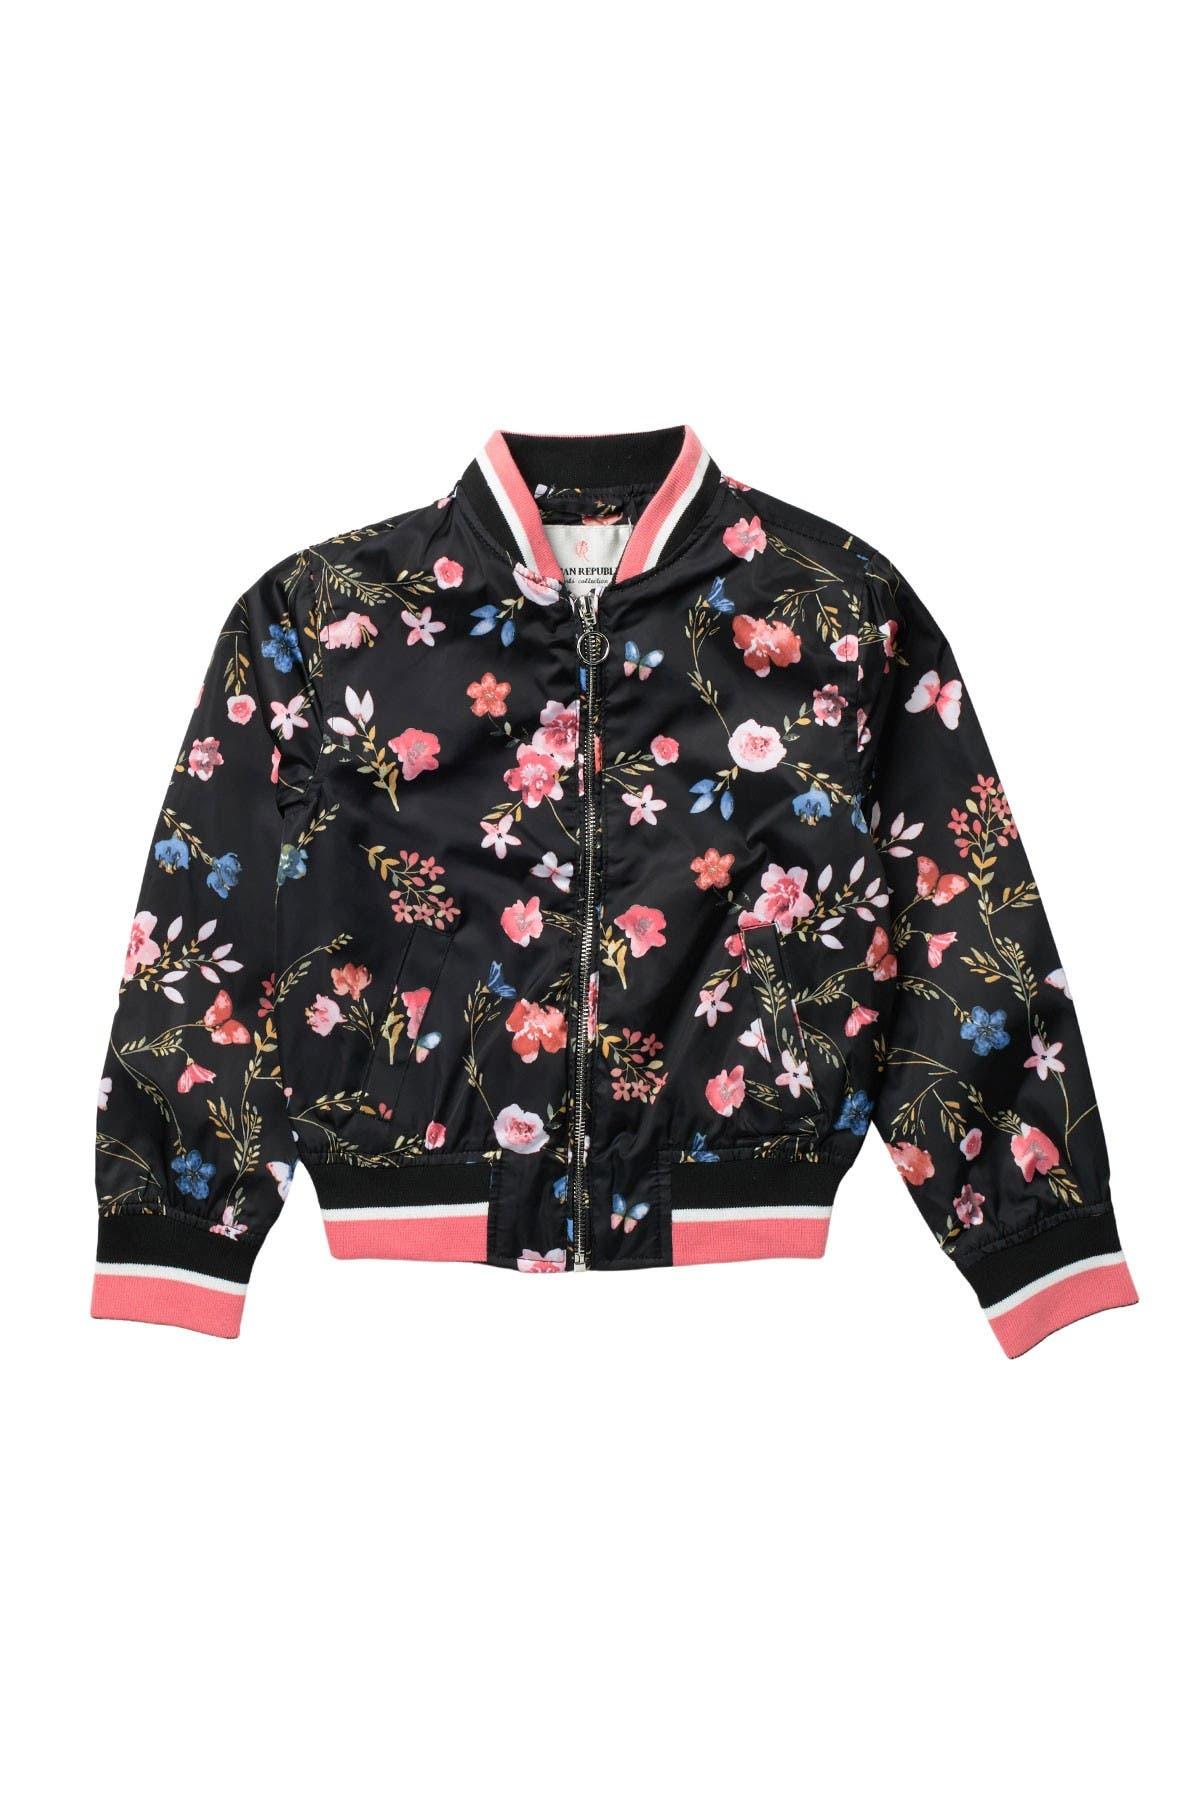 Image of Urban Republic Floral Sateen Bomber Jacket